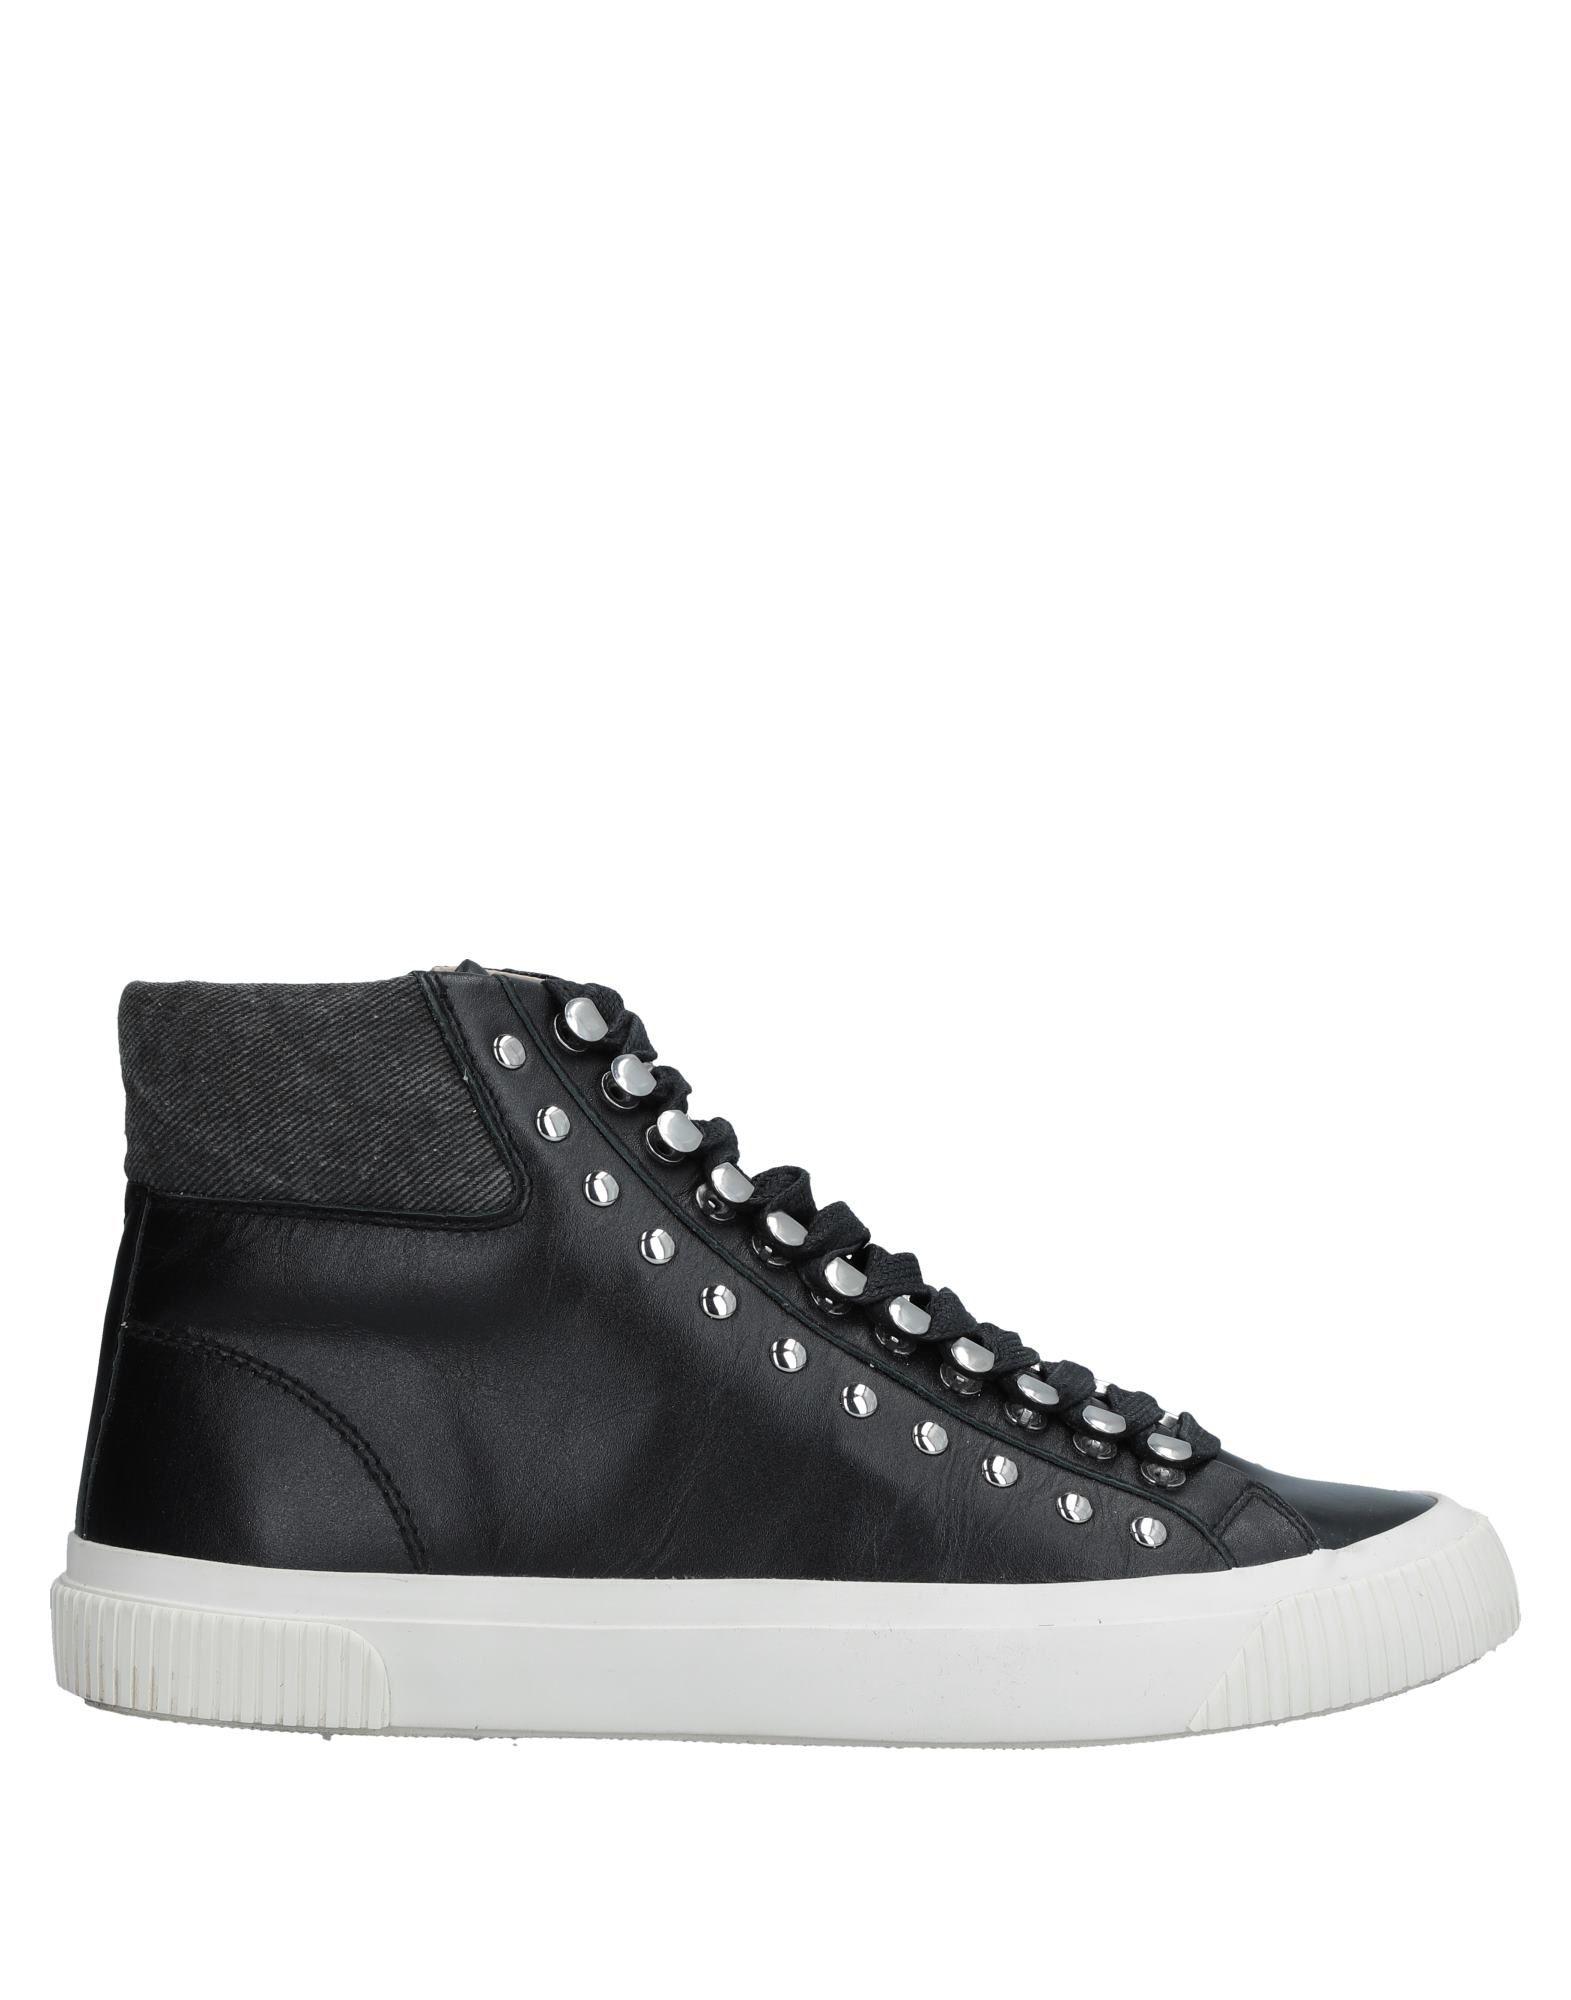 Diesel Sneakers Damen  11535706VE Gute Qualität beliebte Schuhe